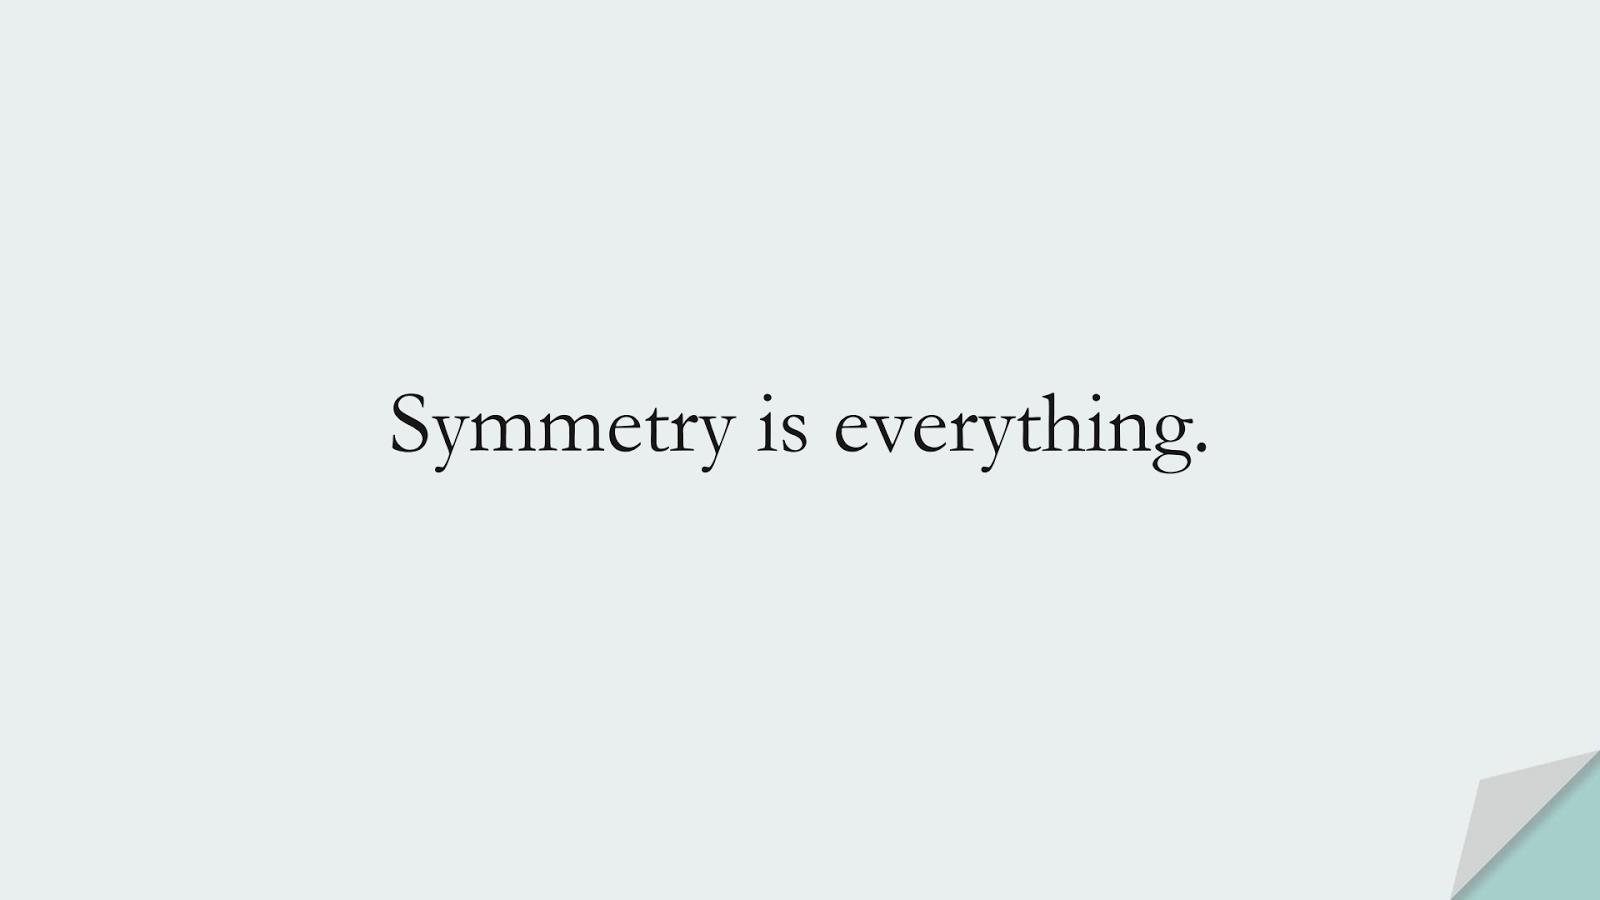 Symmetry is everything.FALSE